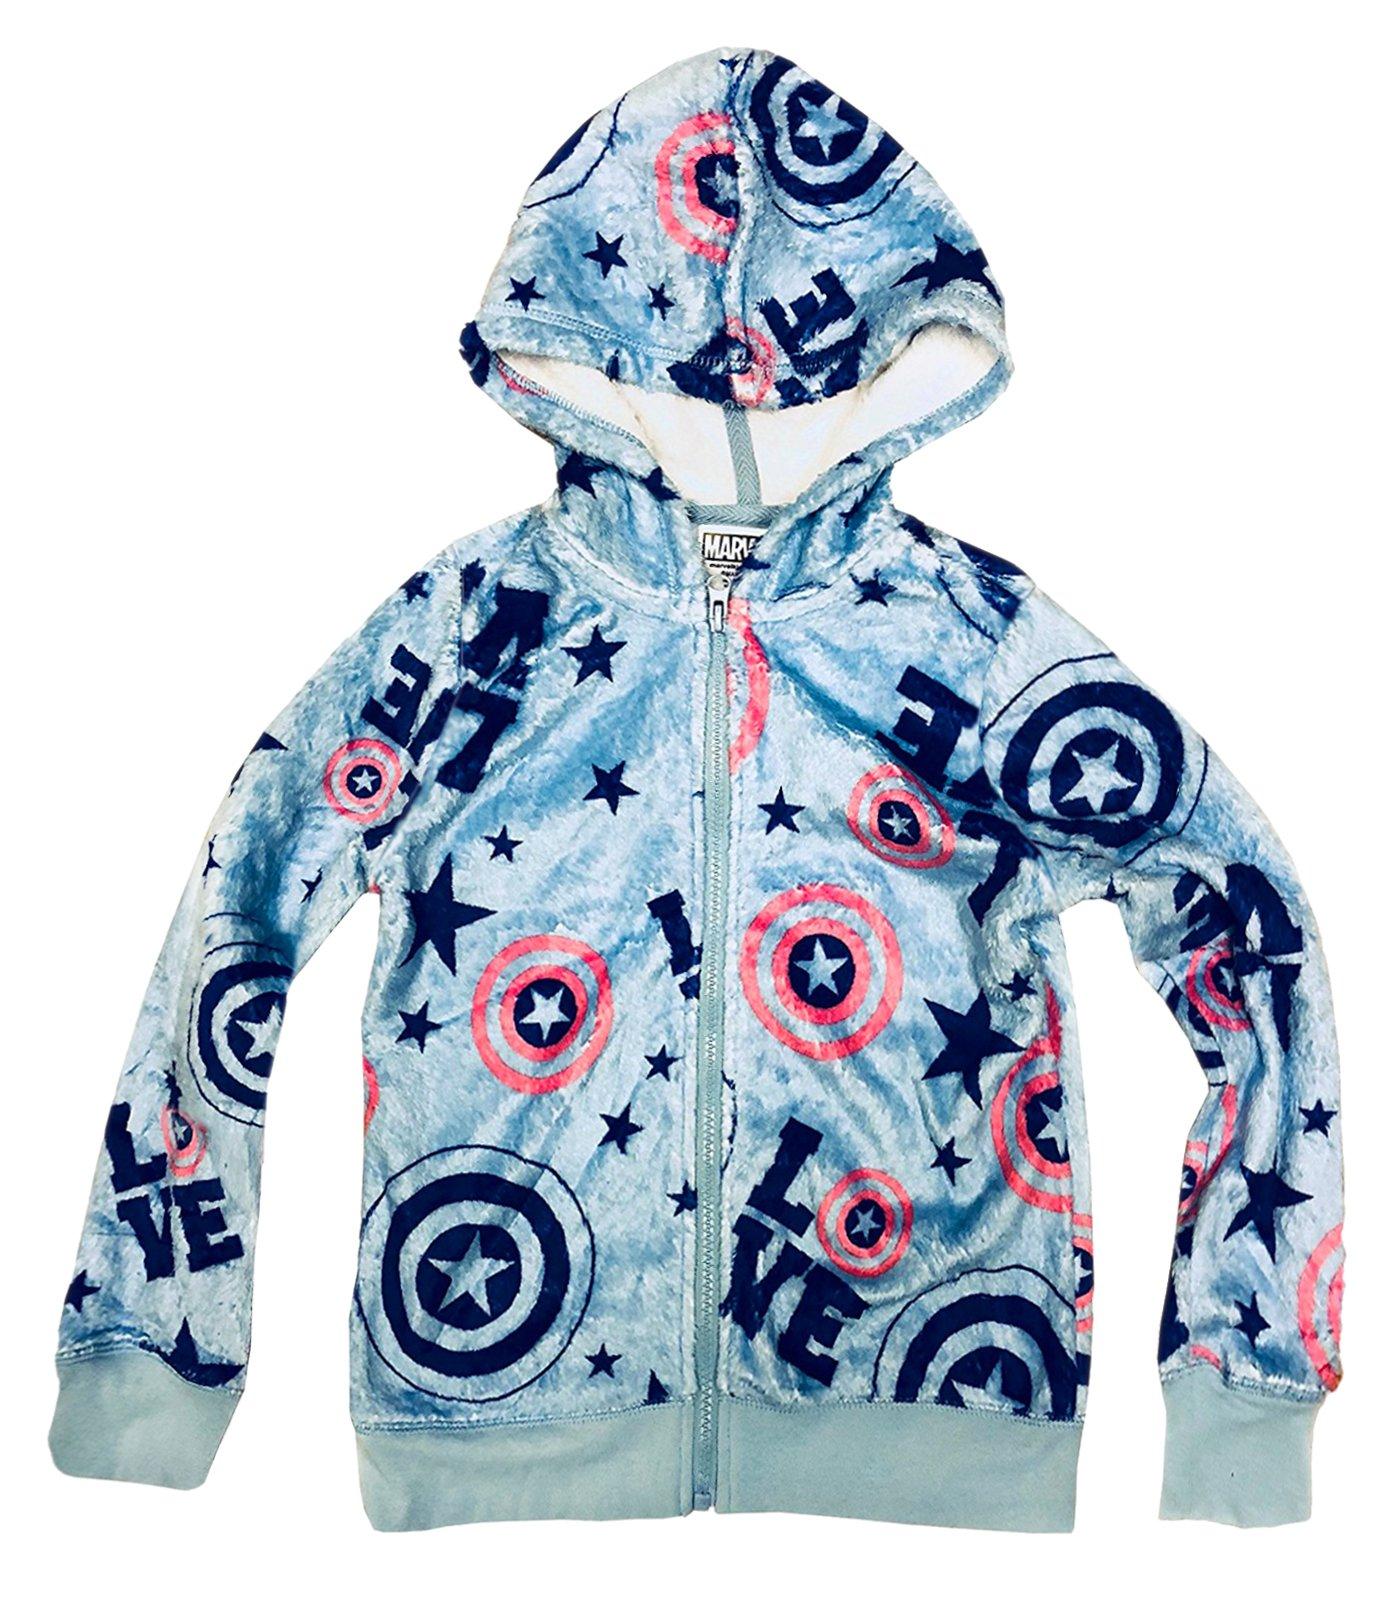 Captain America Marvel Avengers Girls' Love Fleecy Minky Hooded Sweatshirt (XS(4-5))